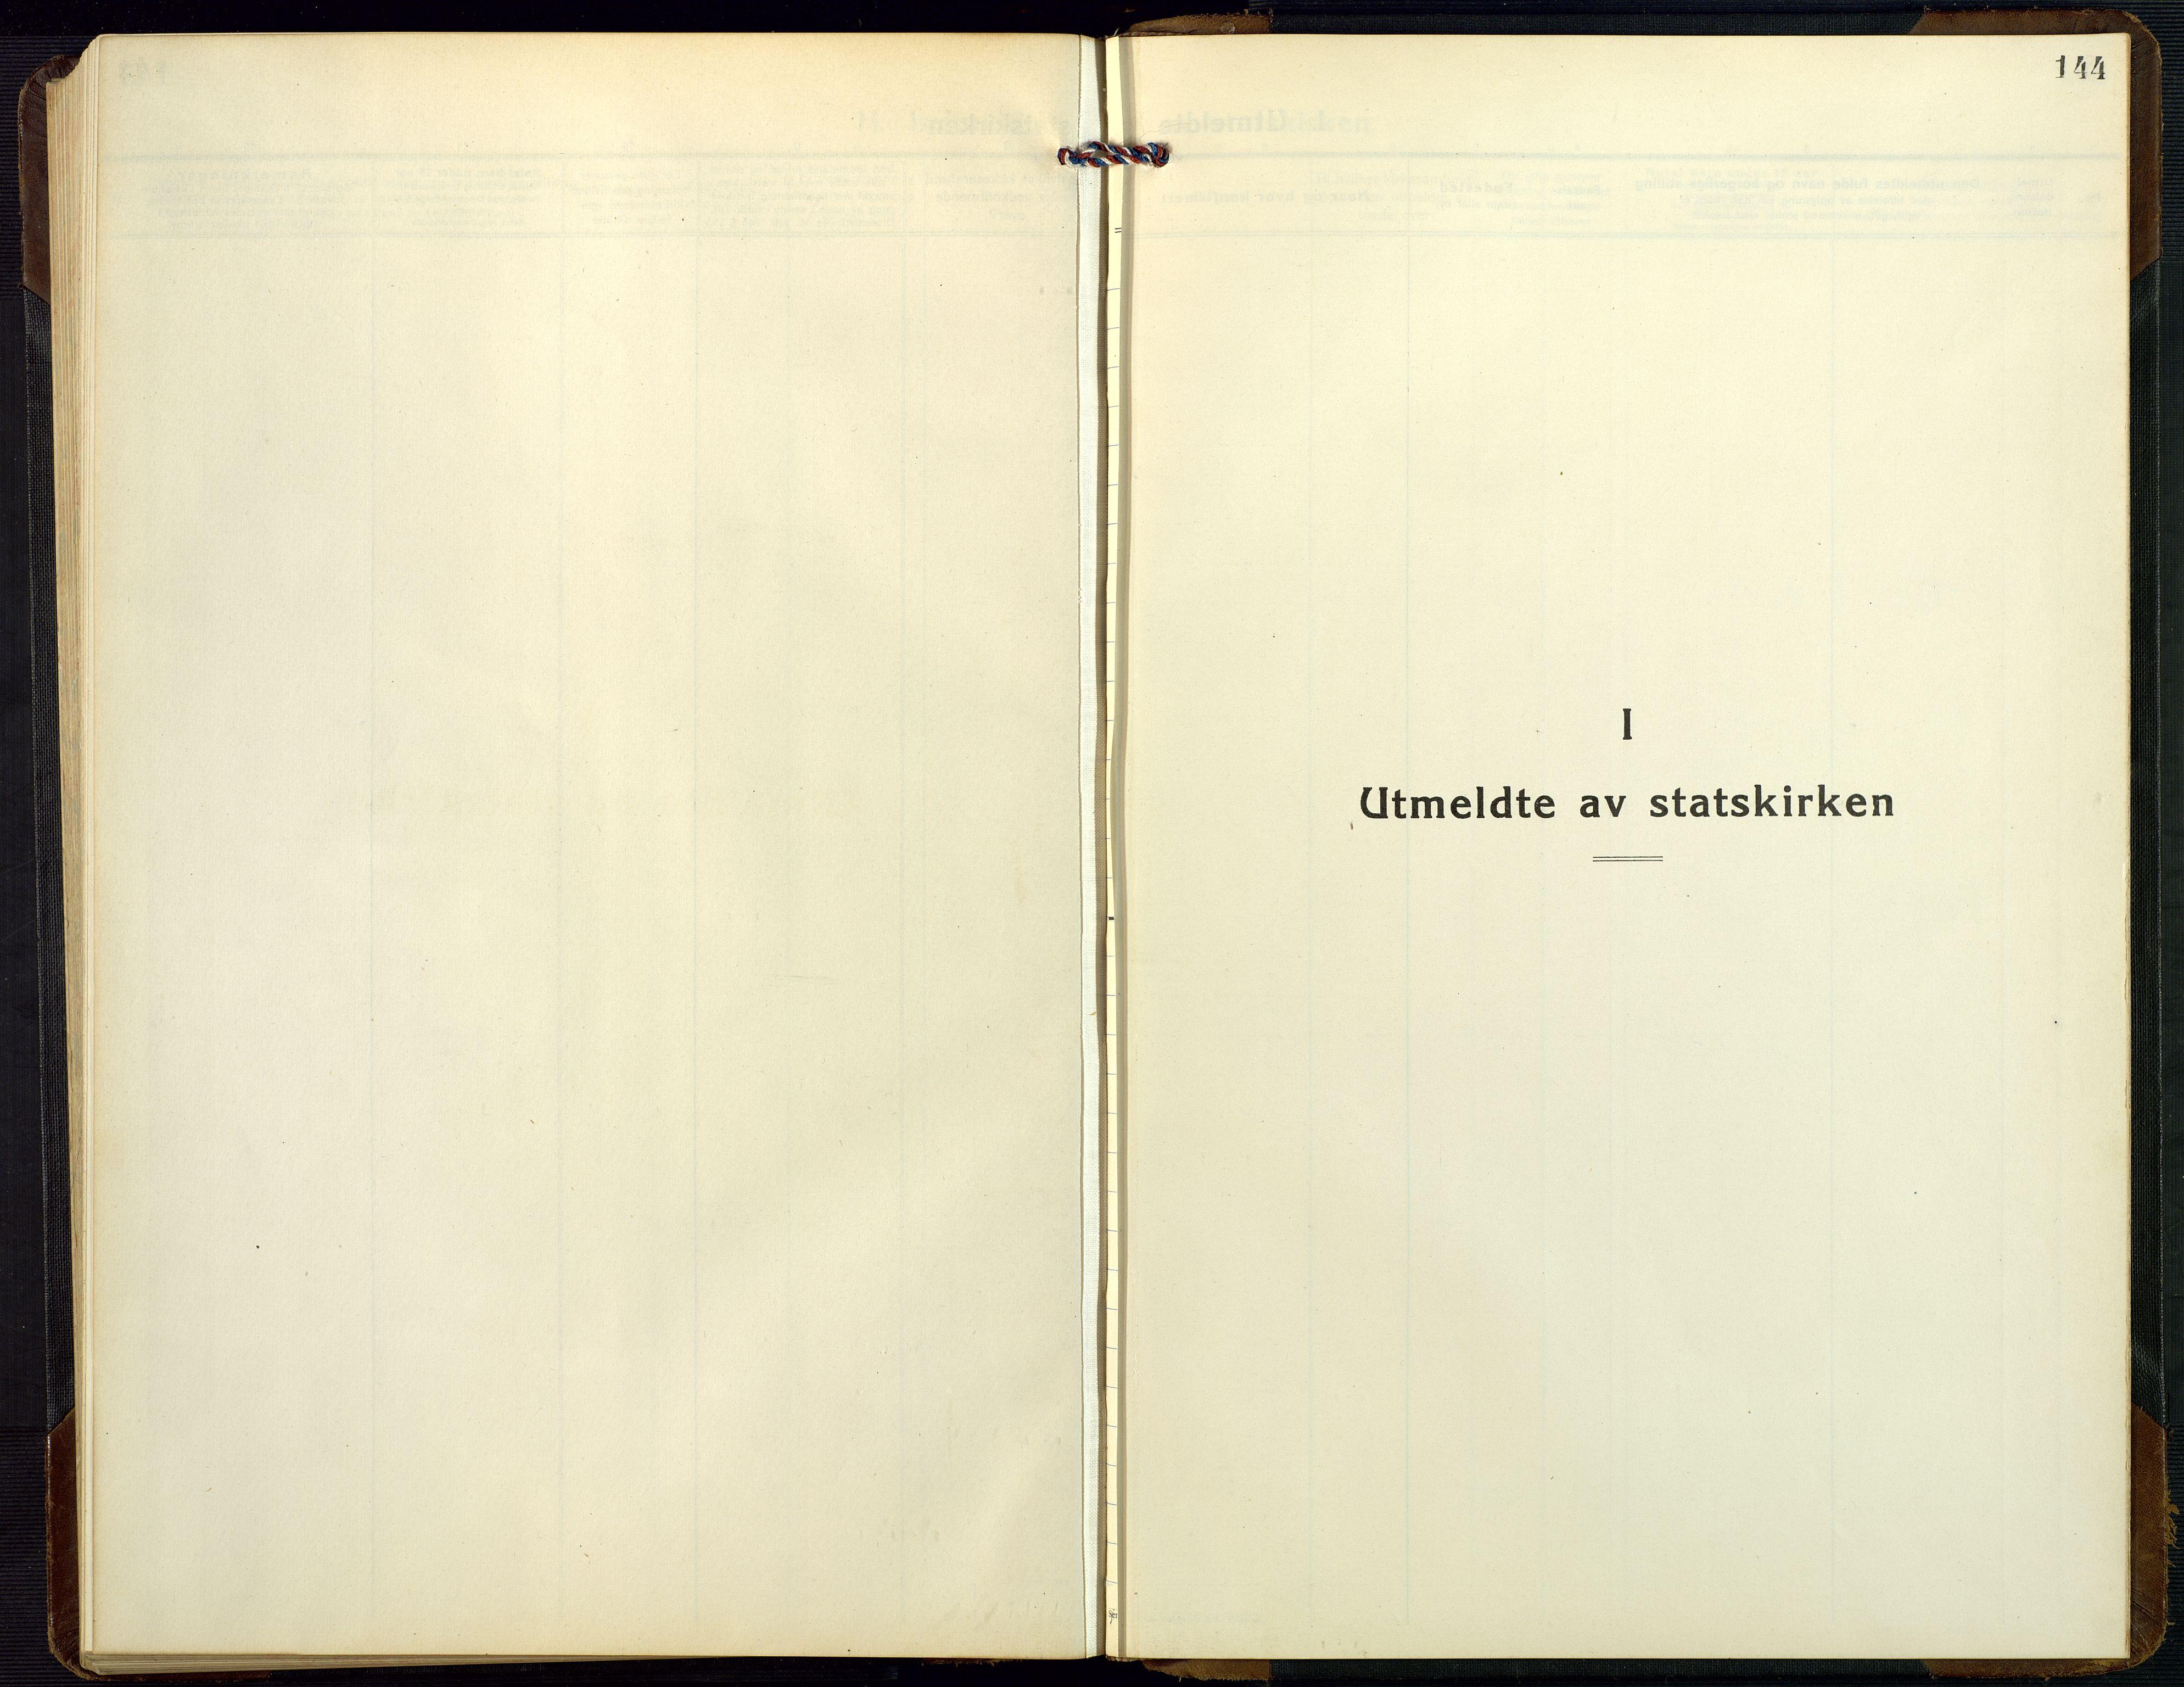 SAK, Dypvåg sokneprestkontor, F/Fb/Fbb/L0006: Klokkerbok nr. B 6, 1925-1954, s. 144